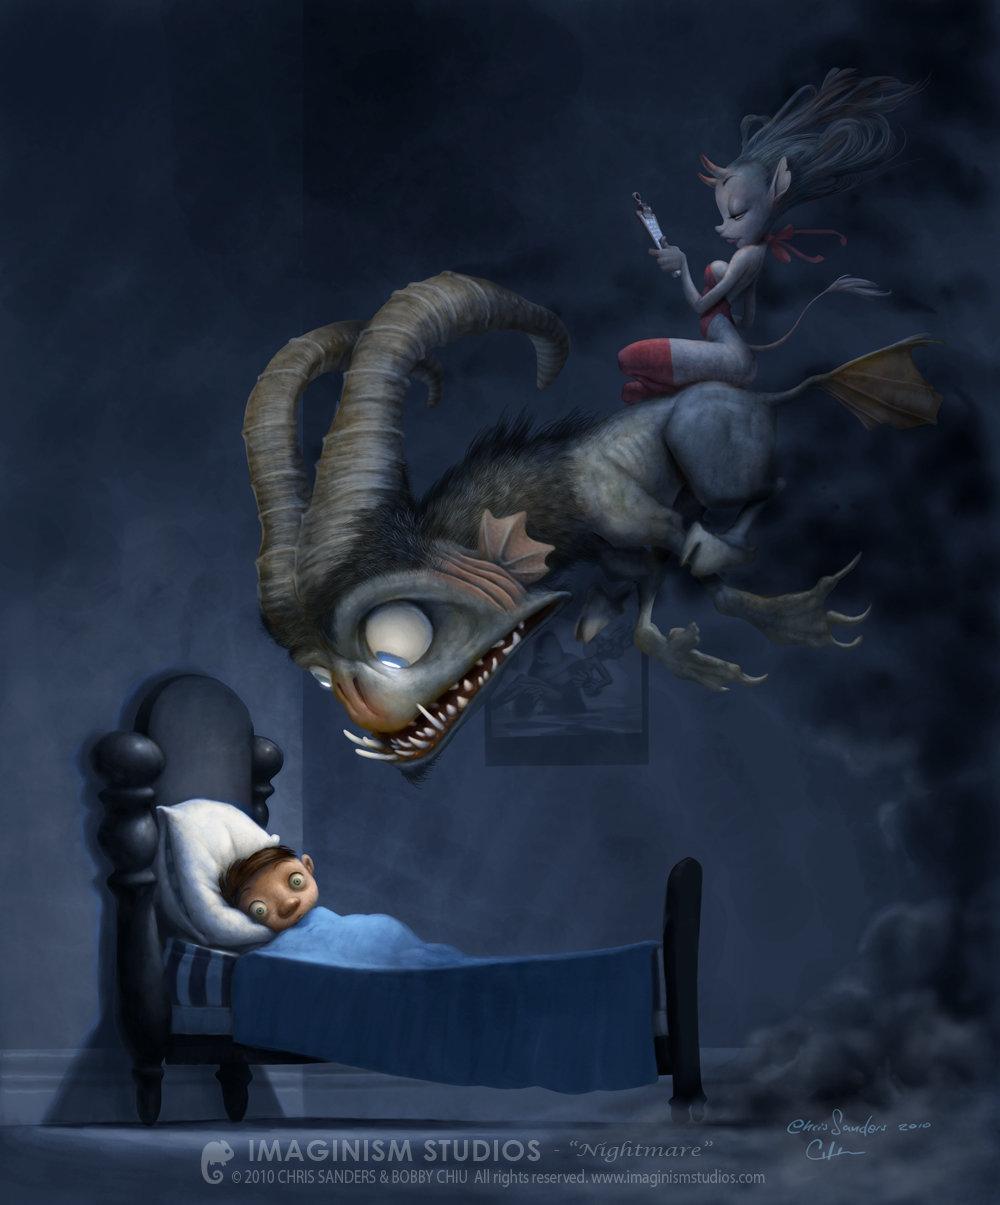 bobby-chiu-nightmare-by-imaginism-d39izzf.jpg